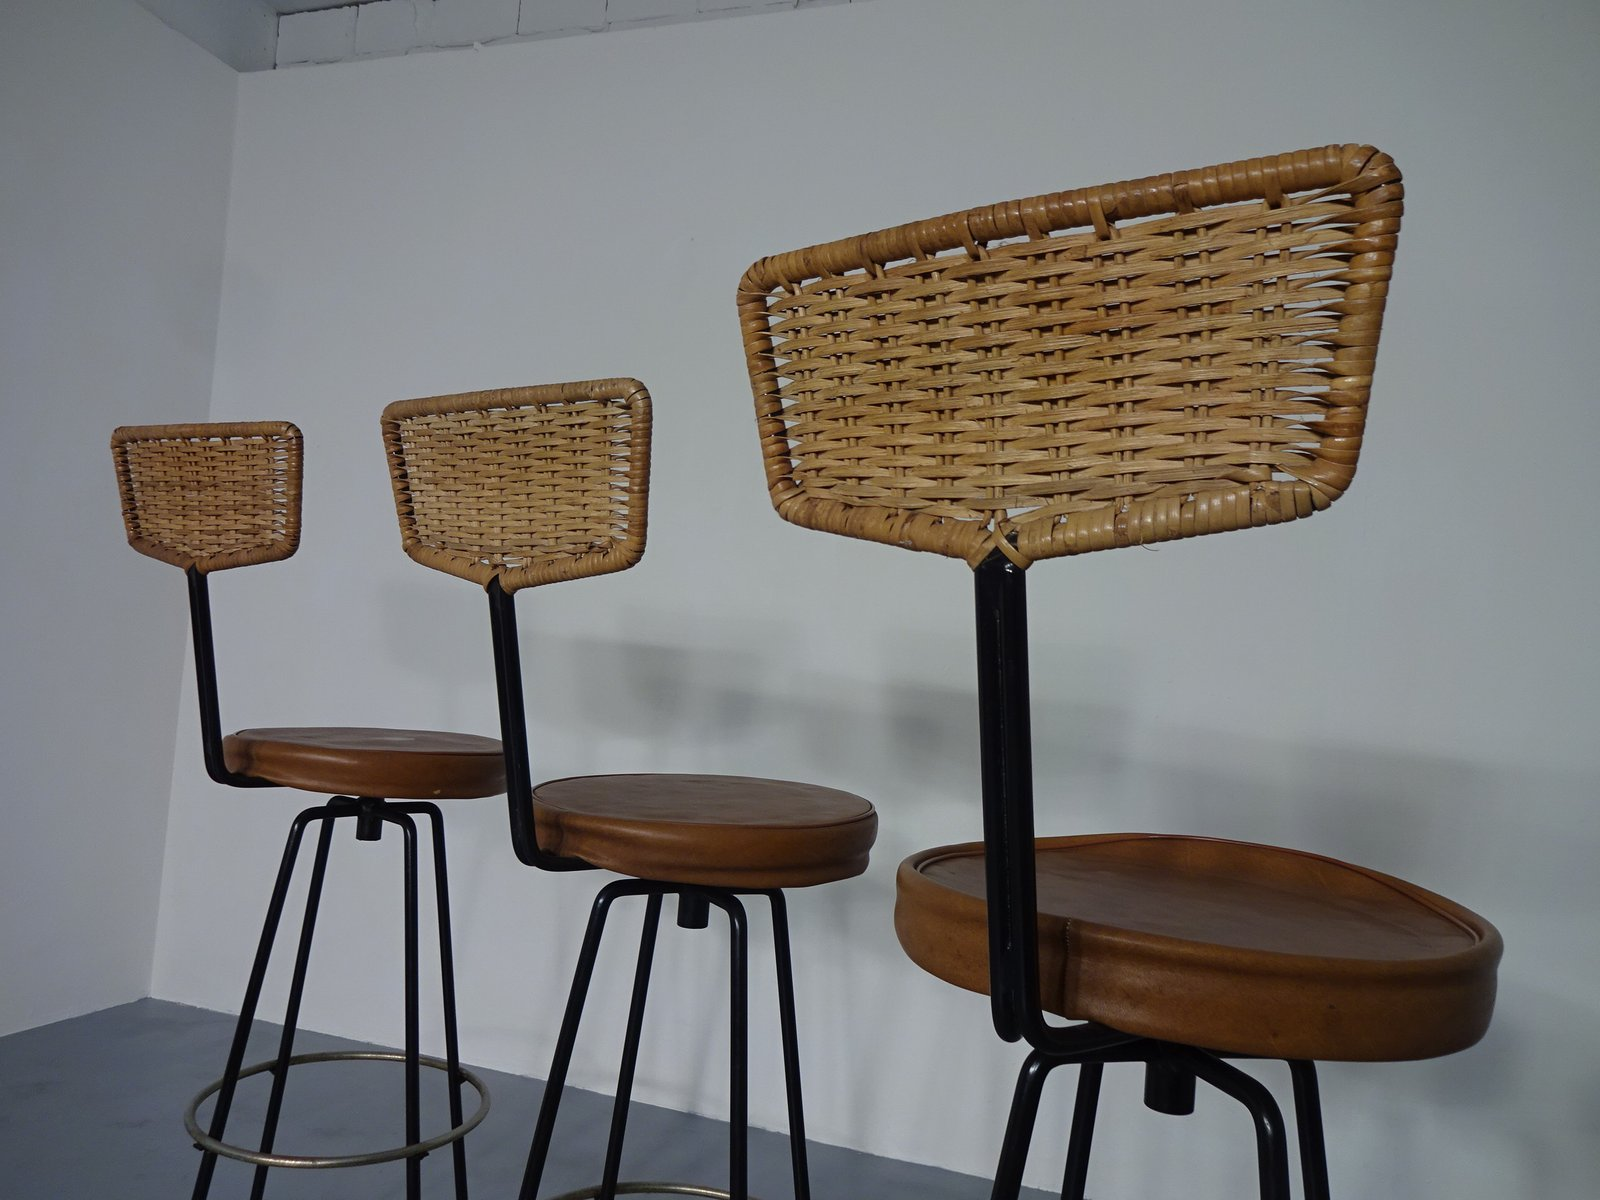 drehbare rattan barhocker 1960er 3er set bei pamono kaufen. Black Bedroom Furniture Sets. Home Design Ideas